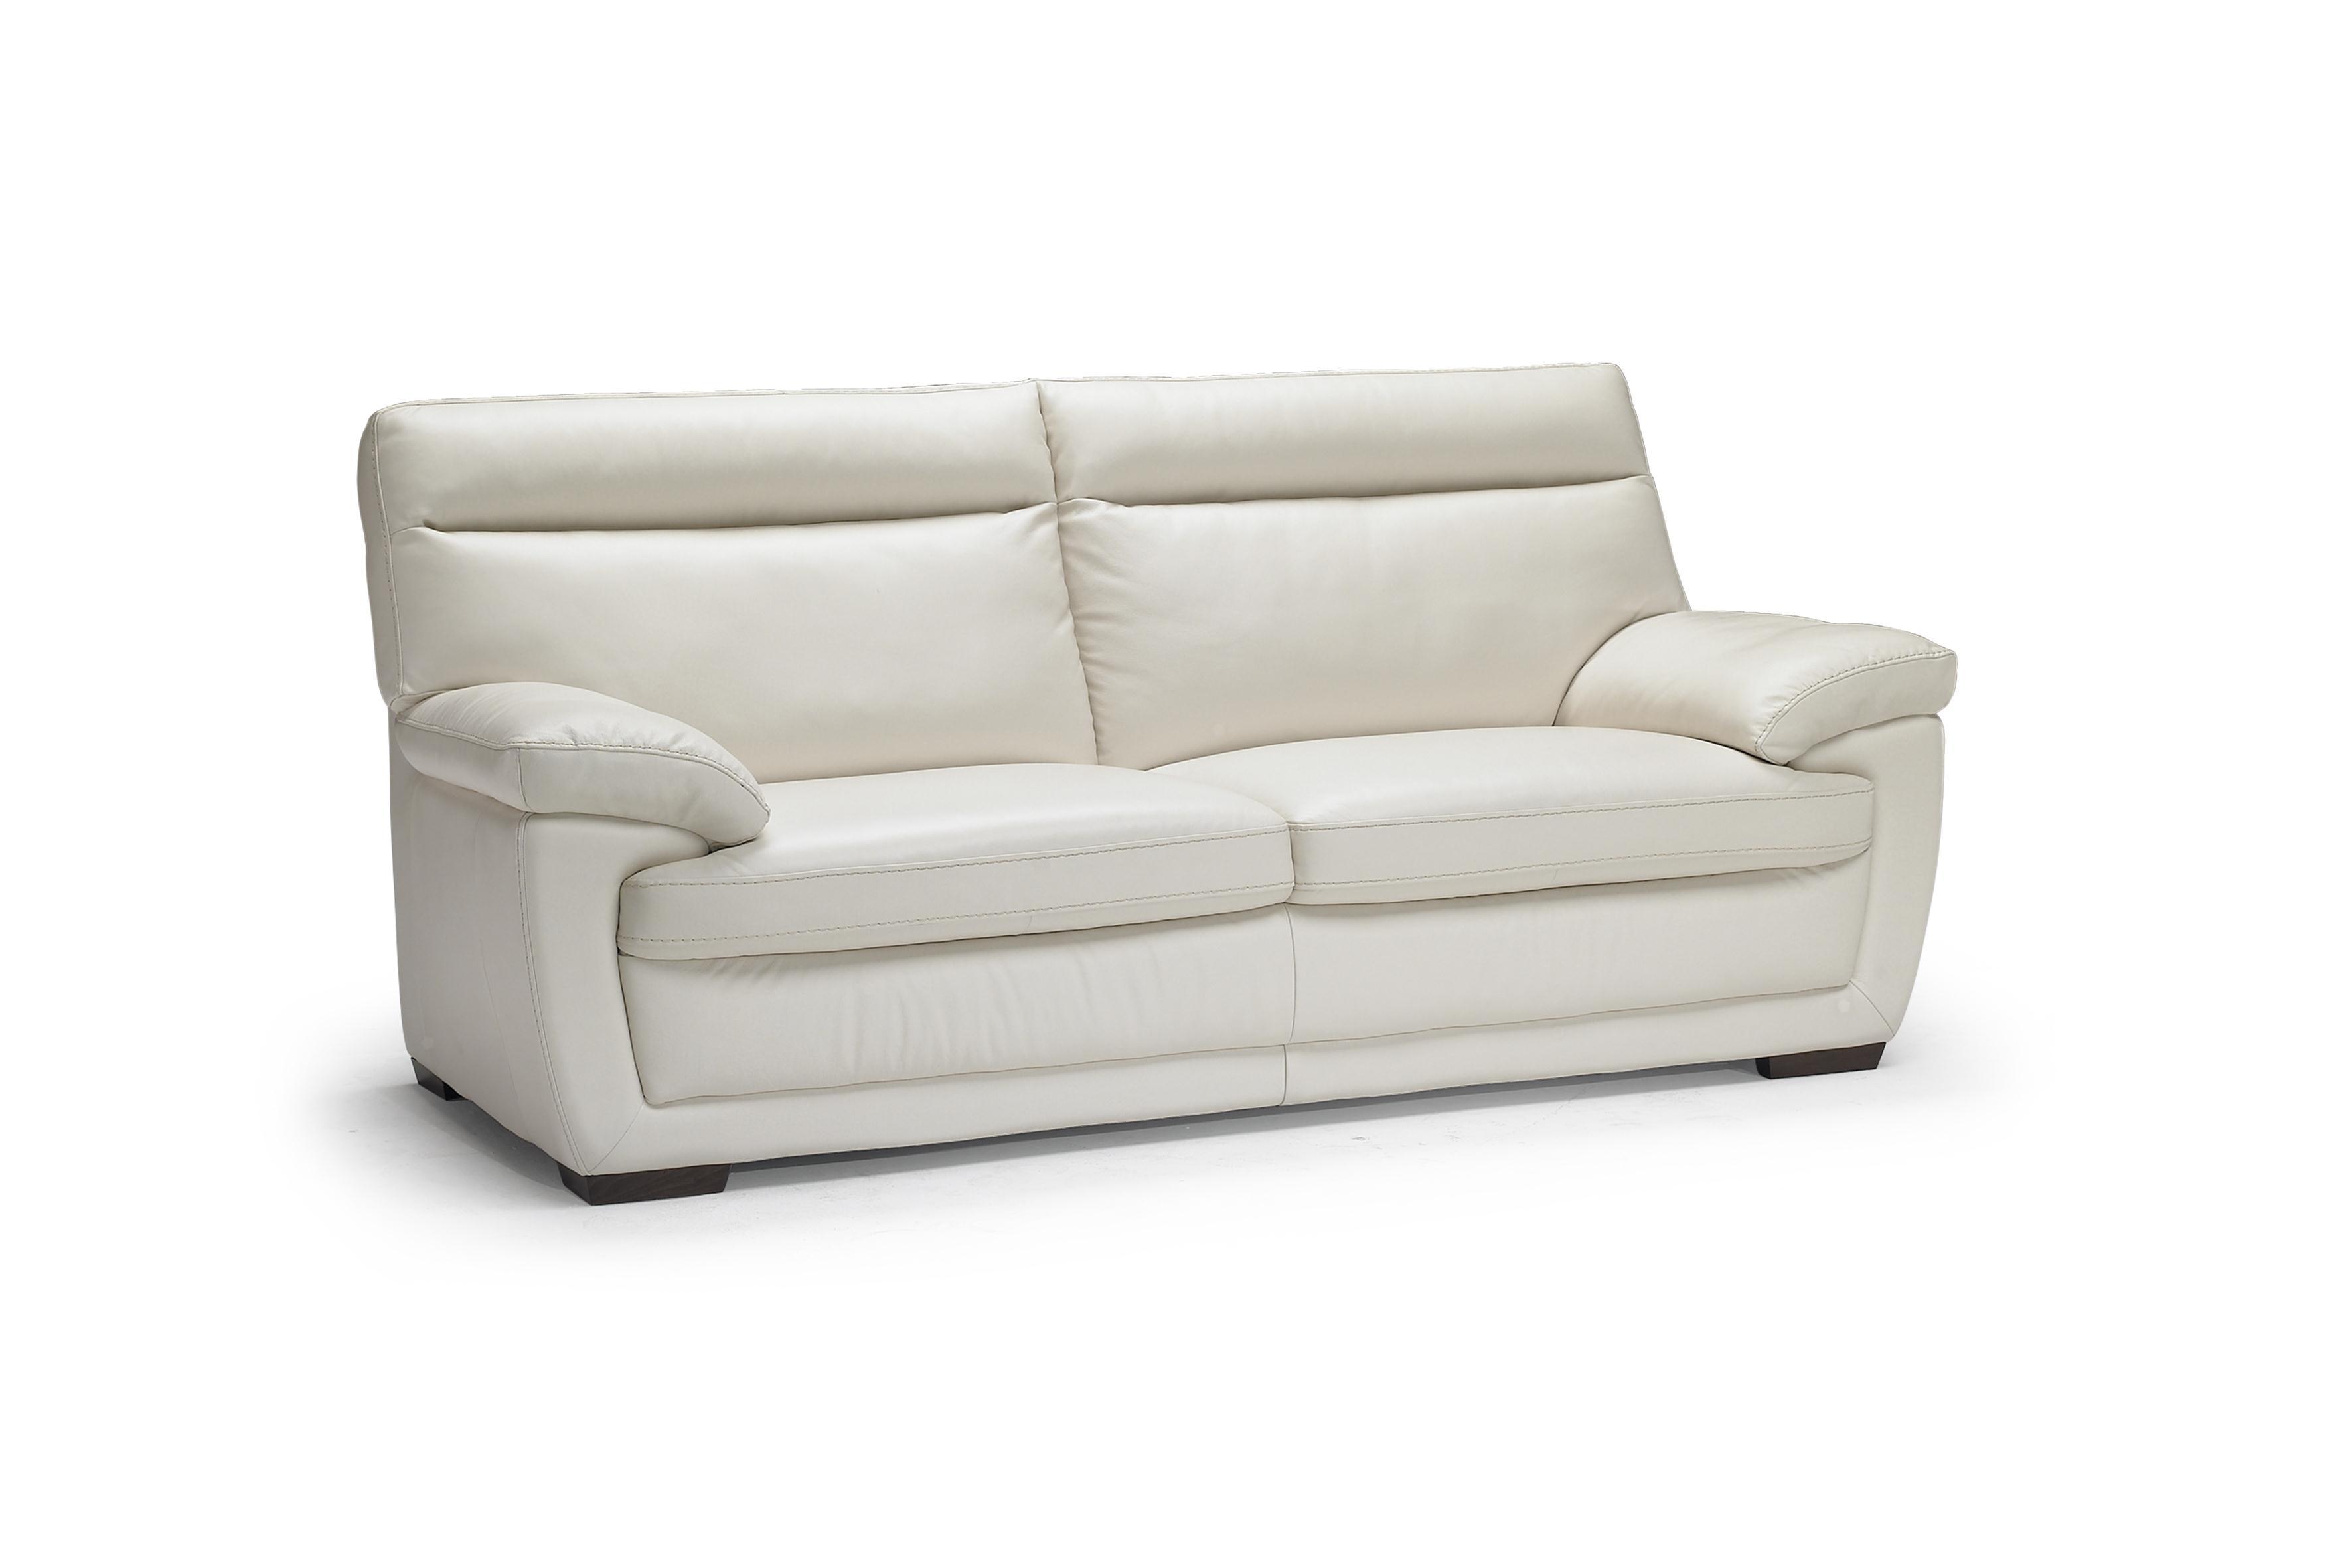 Natuzzi Editions B637 Sofa